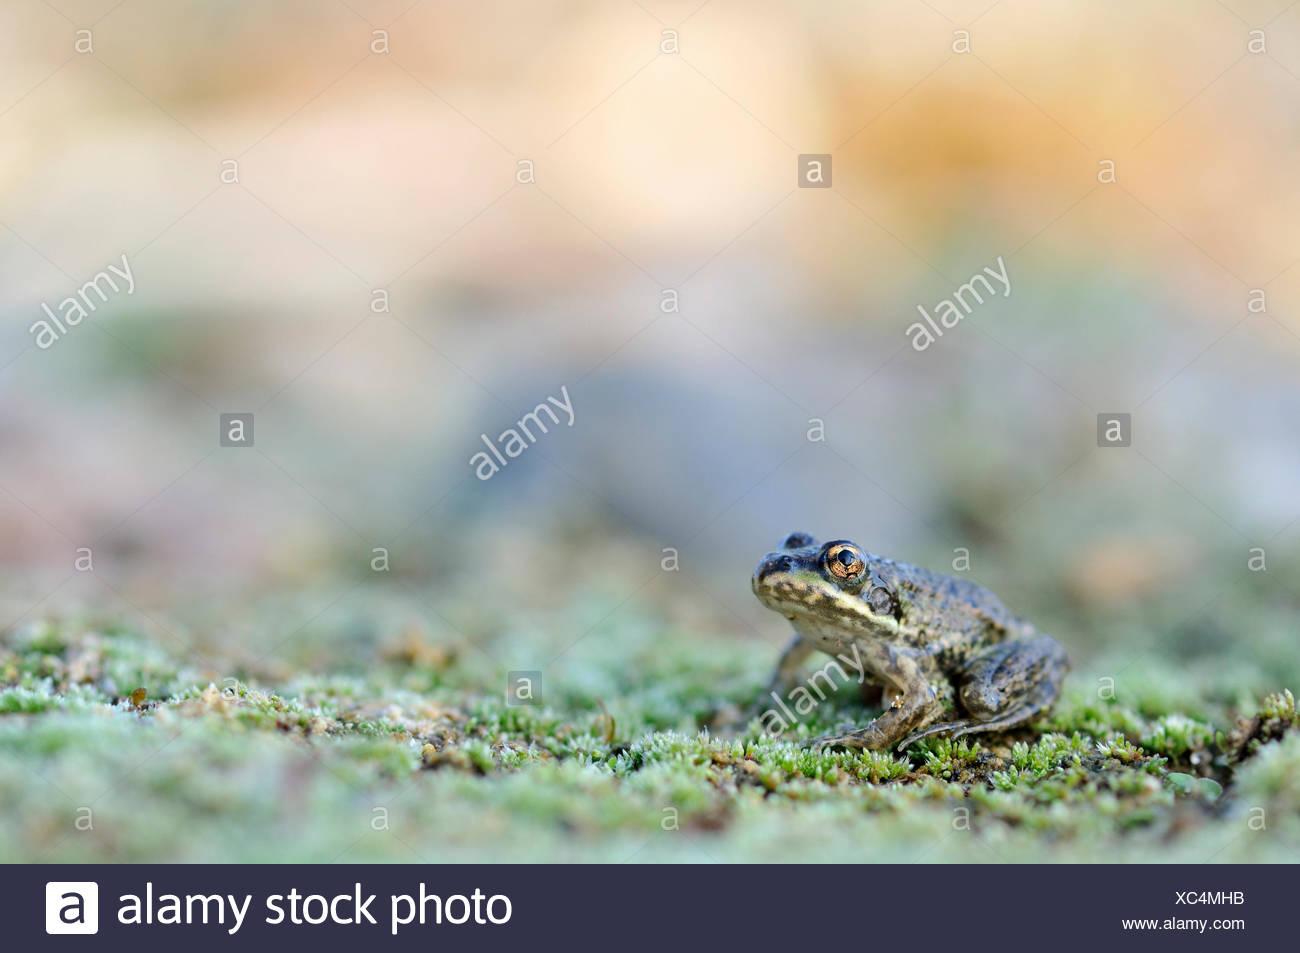 Juvenile Pond Frog (Pelophylax kl. Esculentus, Pelophylax esculentus, Rana esculenta) in a gravel pit near Leipzig, Saxony - Stock Image